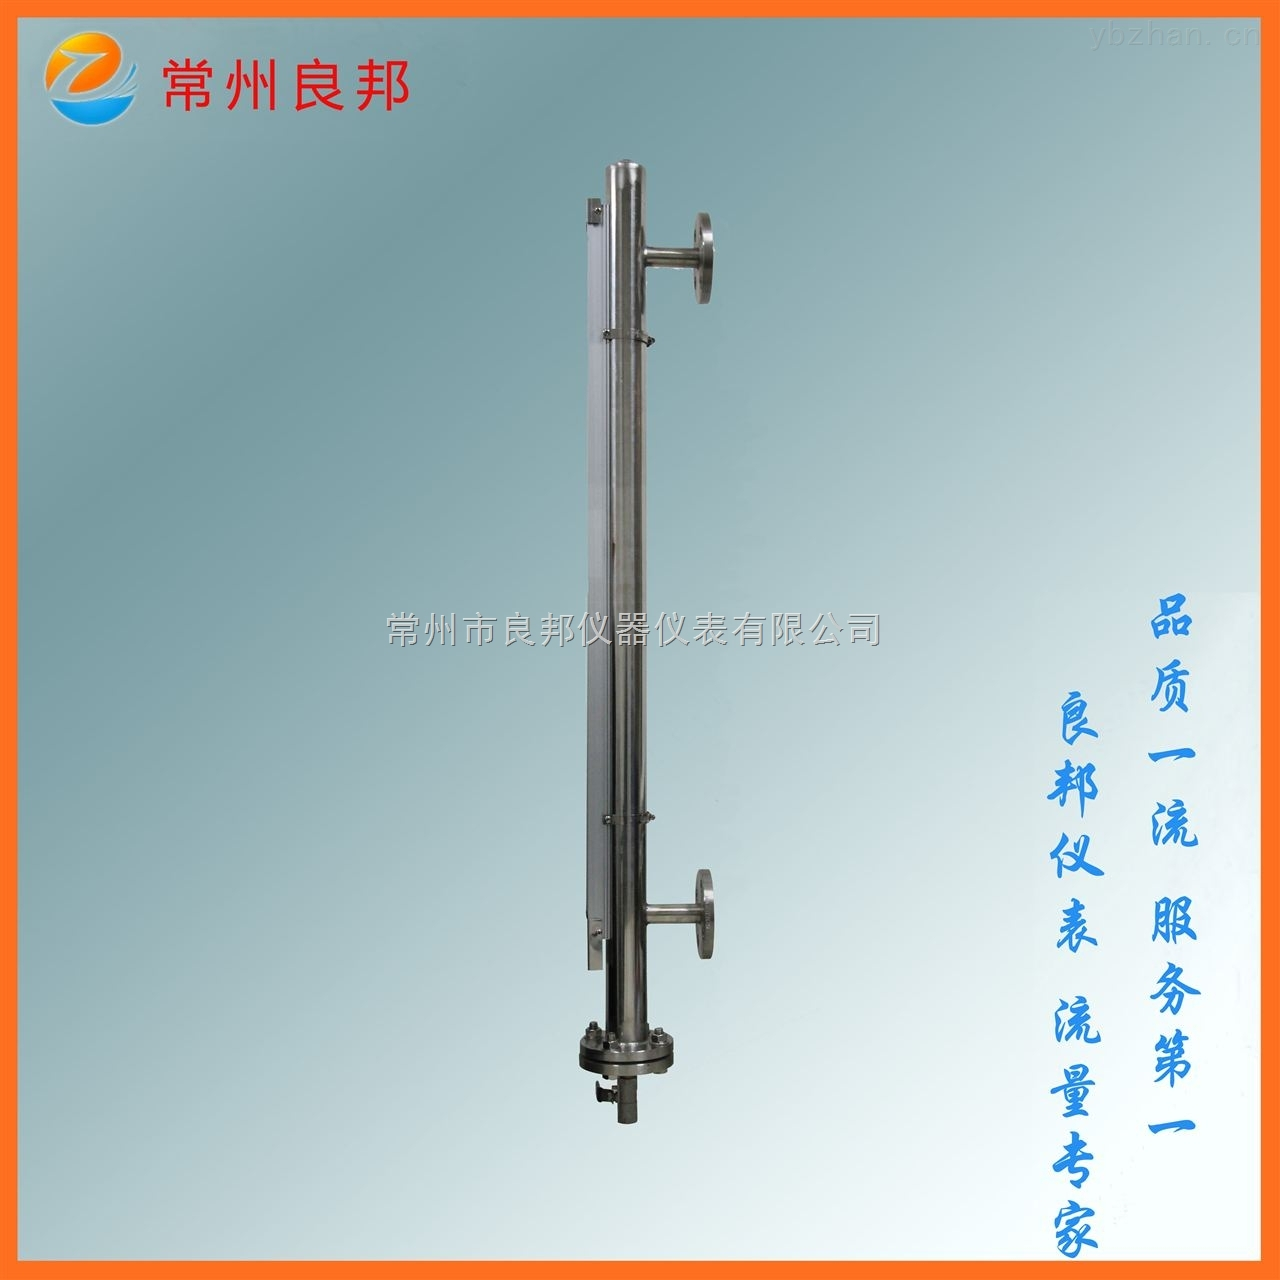 UHZ-571-侧装磁翻板液位计 厂家直销质量上乘性价比高 铝合金翻板耐高温304不锈钢测量管